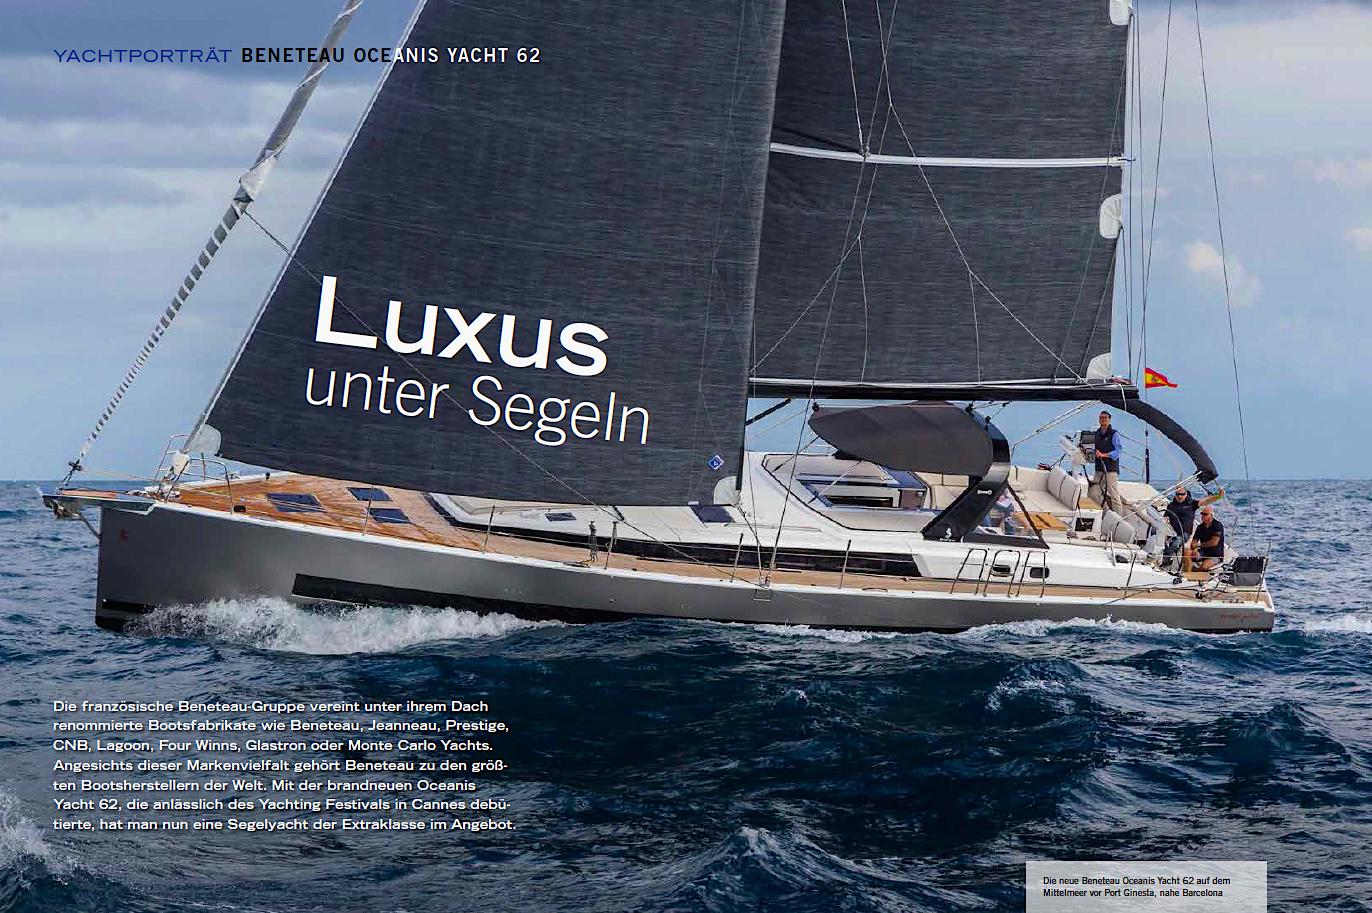 Luxus segelyachten  Beneteau Oceanis Yacht 62 - Der Yachtfotograf